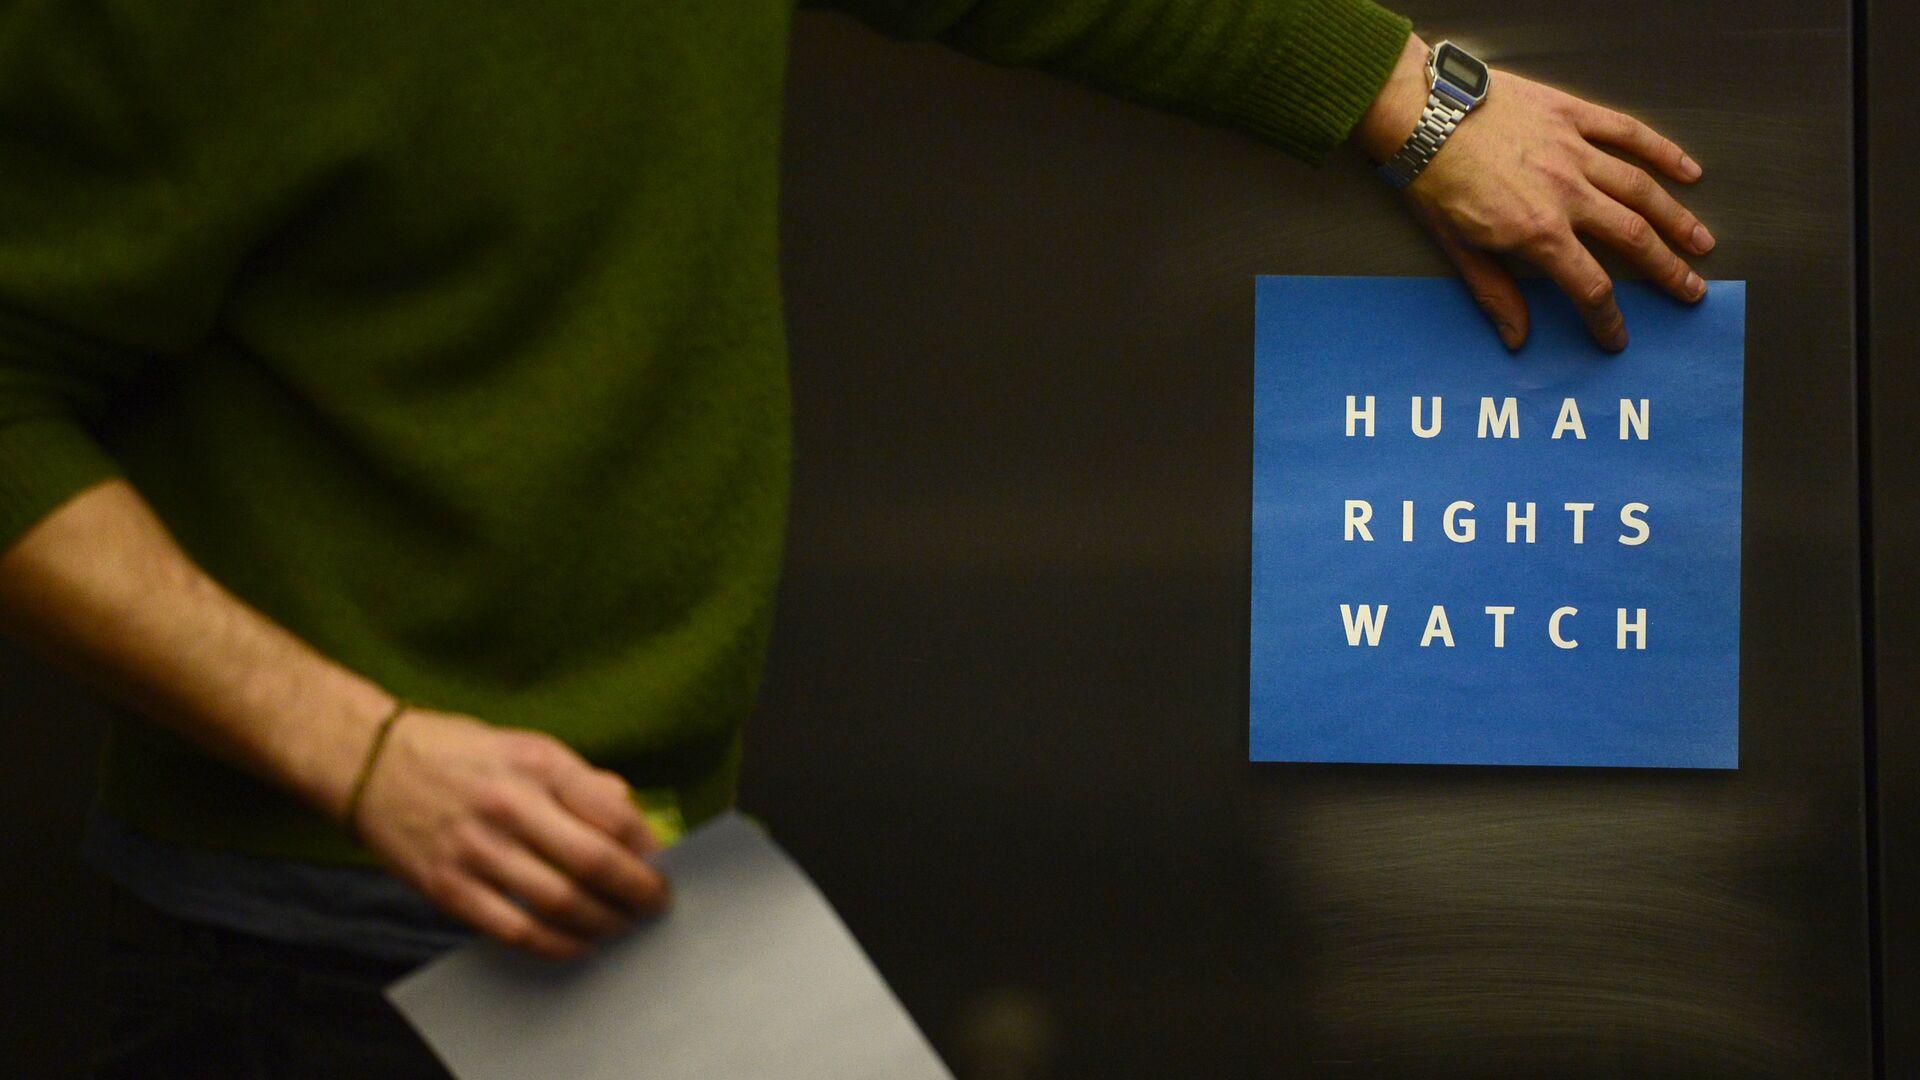 Logo de Human Rights Watch - Sputnik Mundo, 1920, 26.07.2021